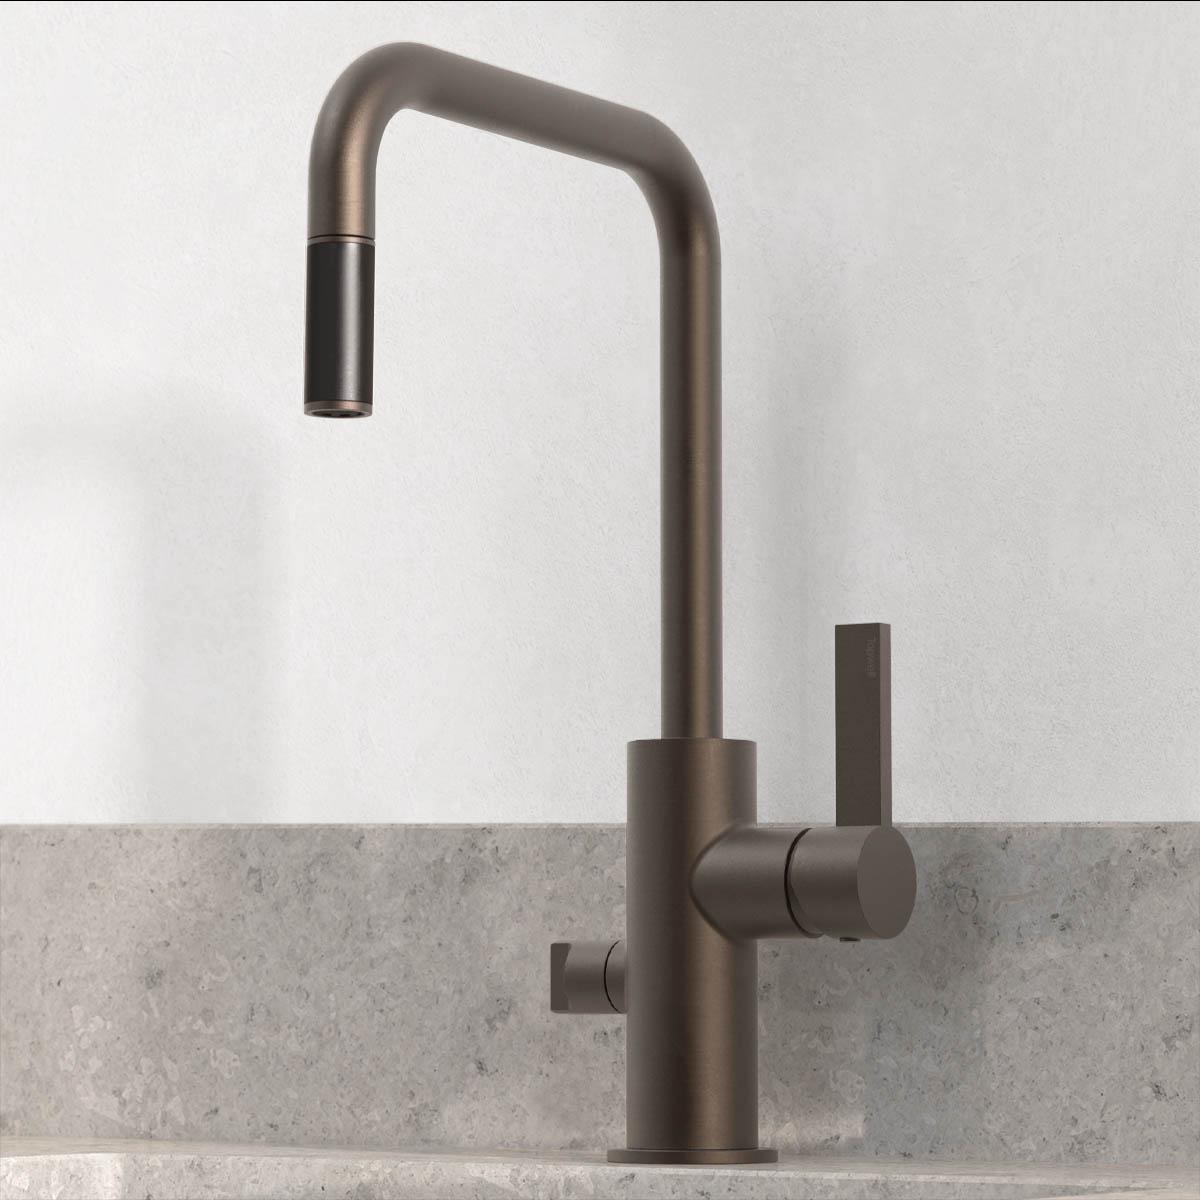 tapwell koksblandare arm887 bronze 9422678 noble concrete grey